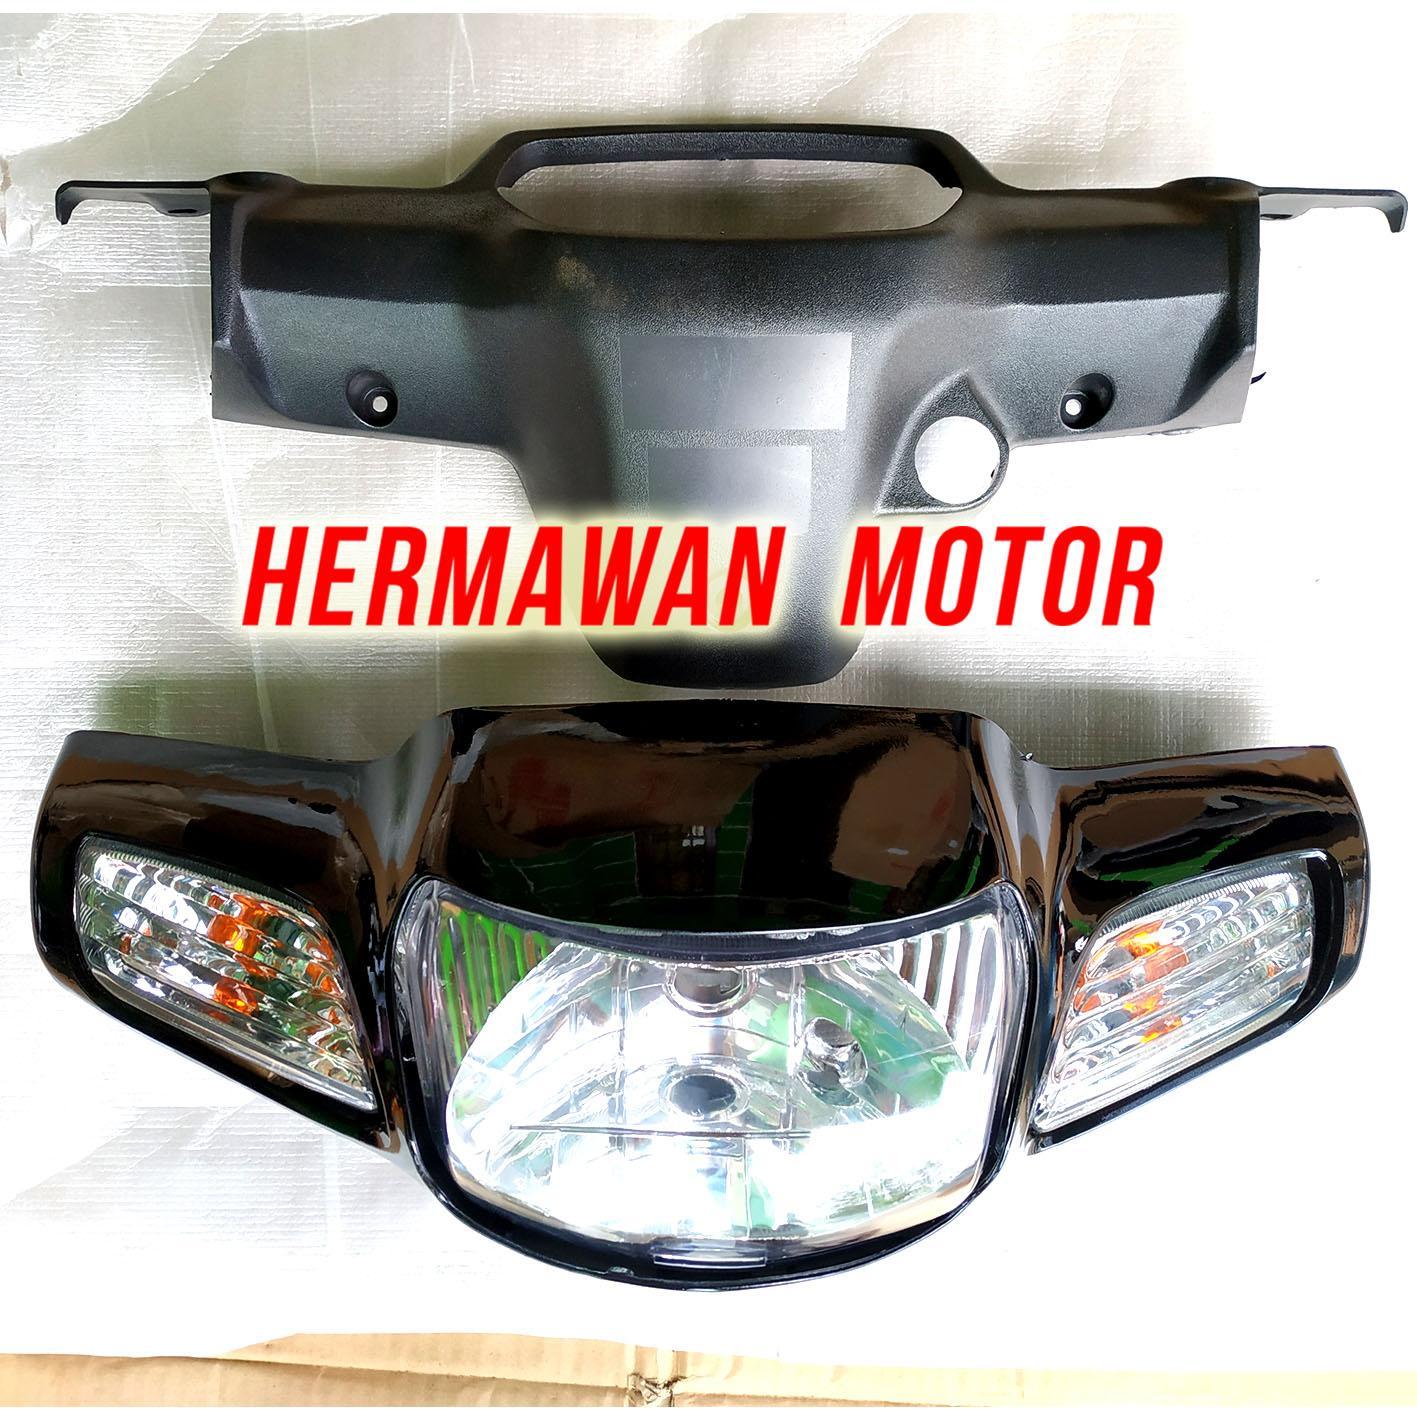 Batok depan belakang Honda legenda 2 lampu depan dan sen warna hitam